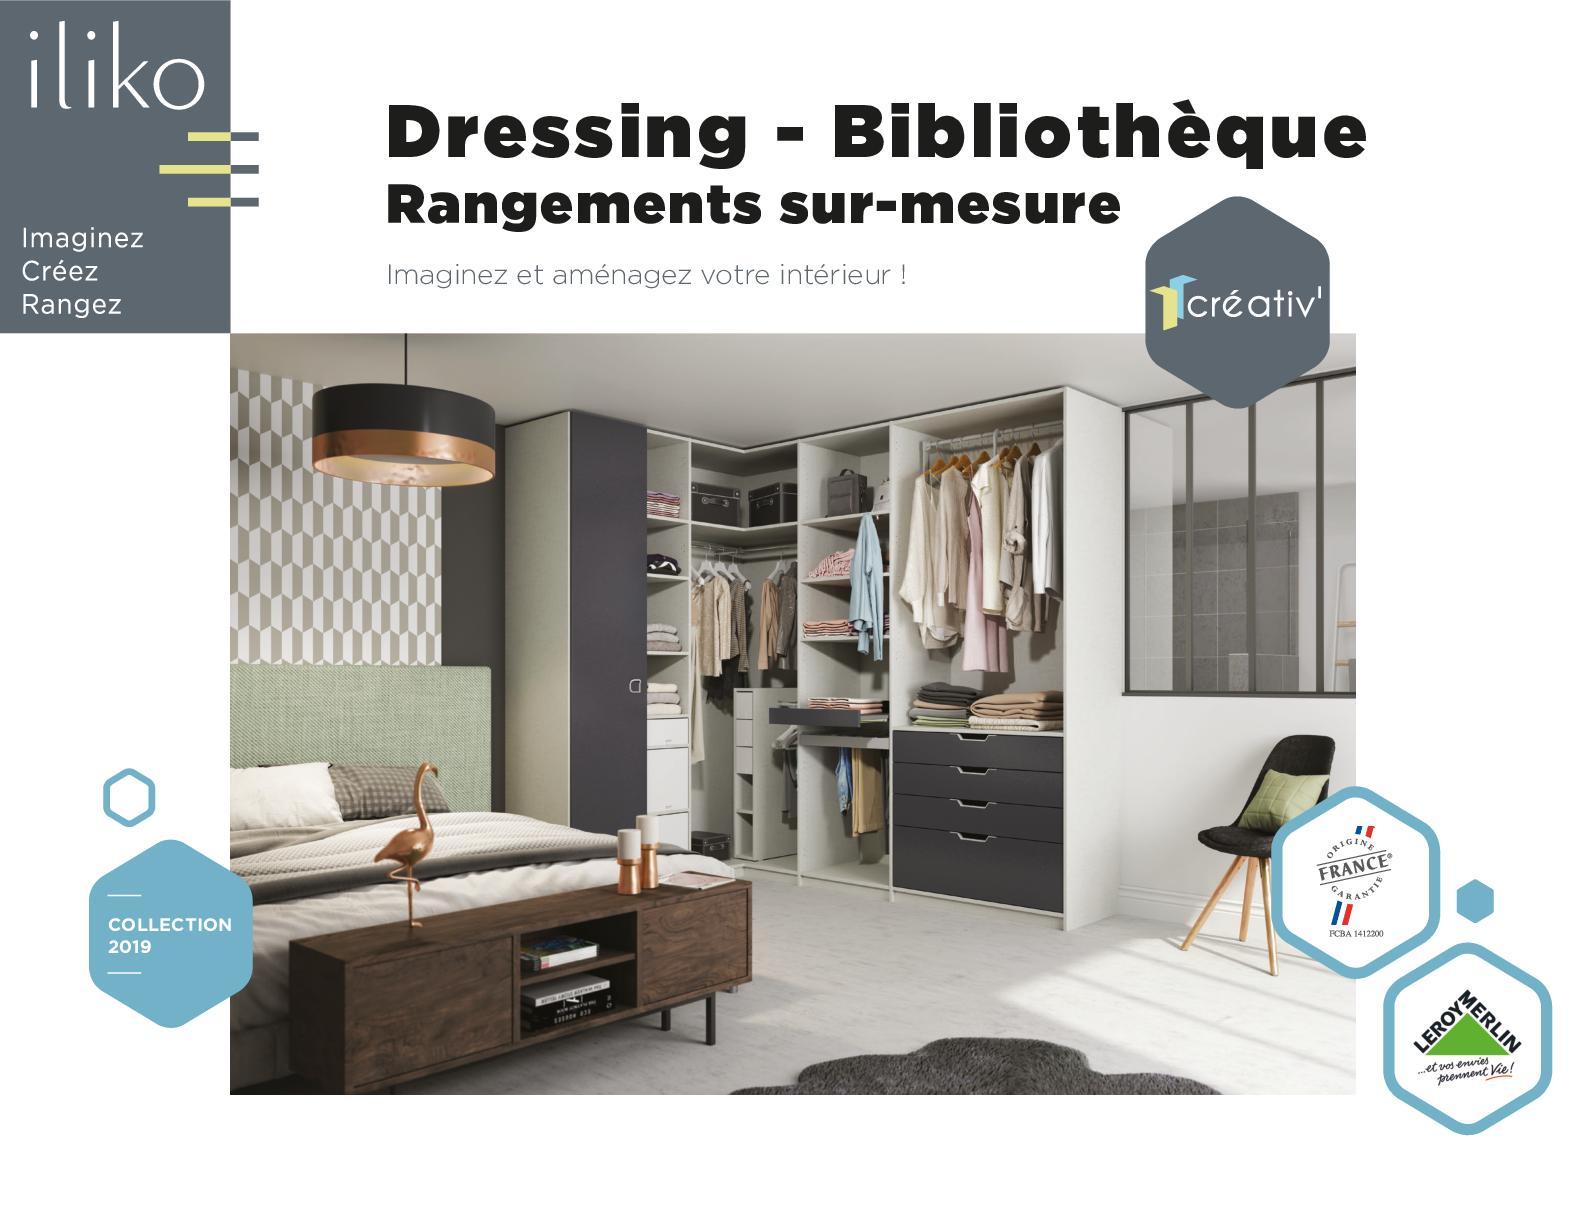 Coût Bibliothèque Sur Mesure calaméo - catalogue iliko lm dressing 2019